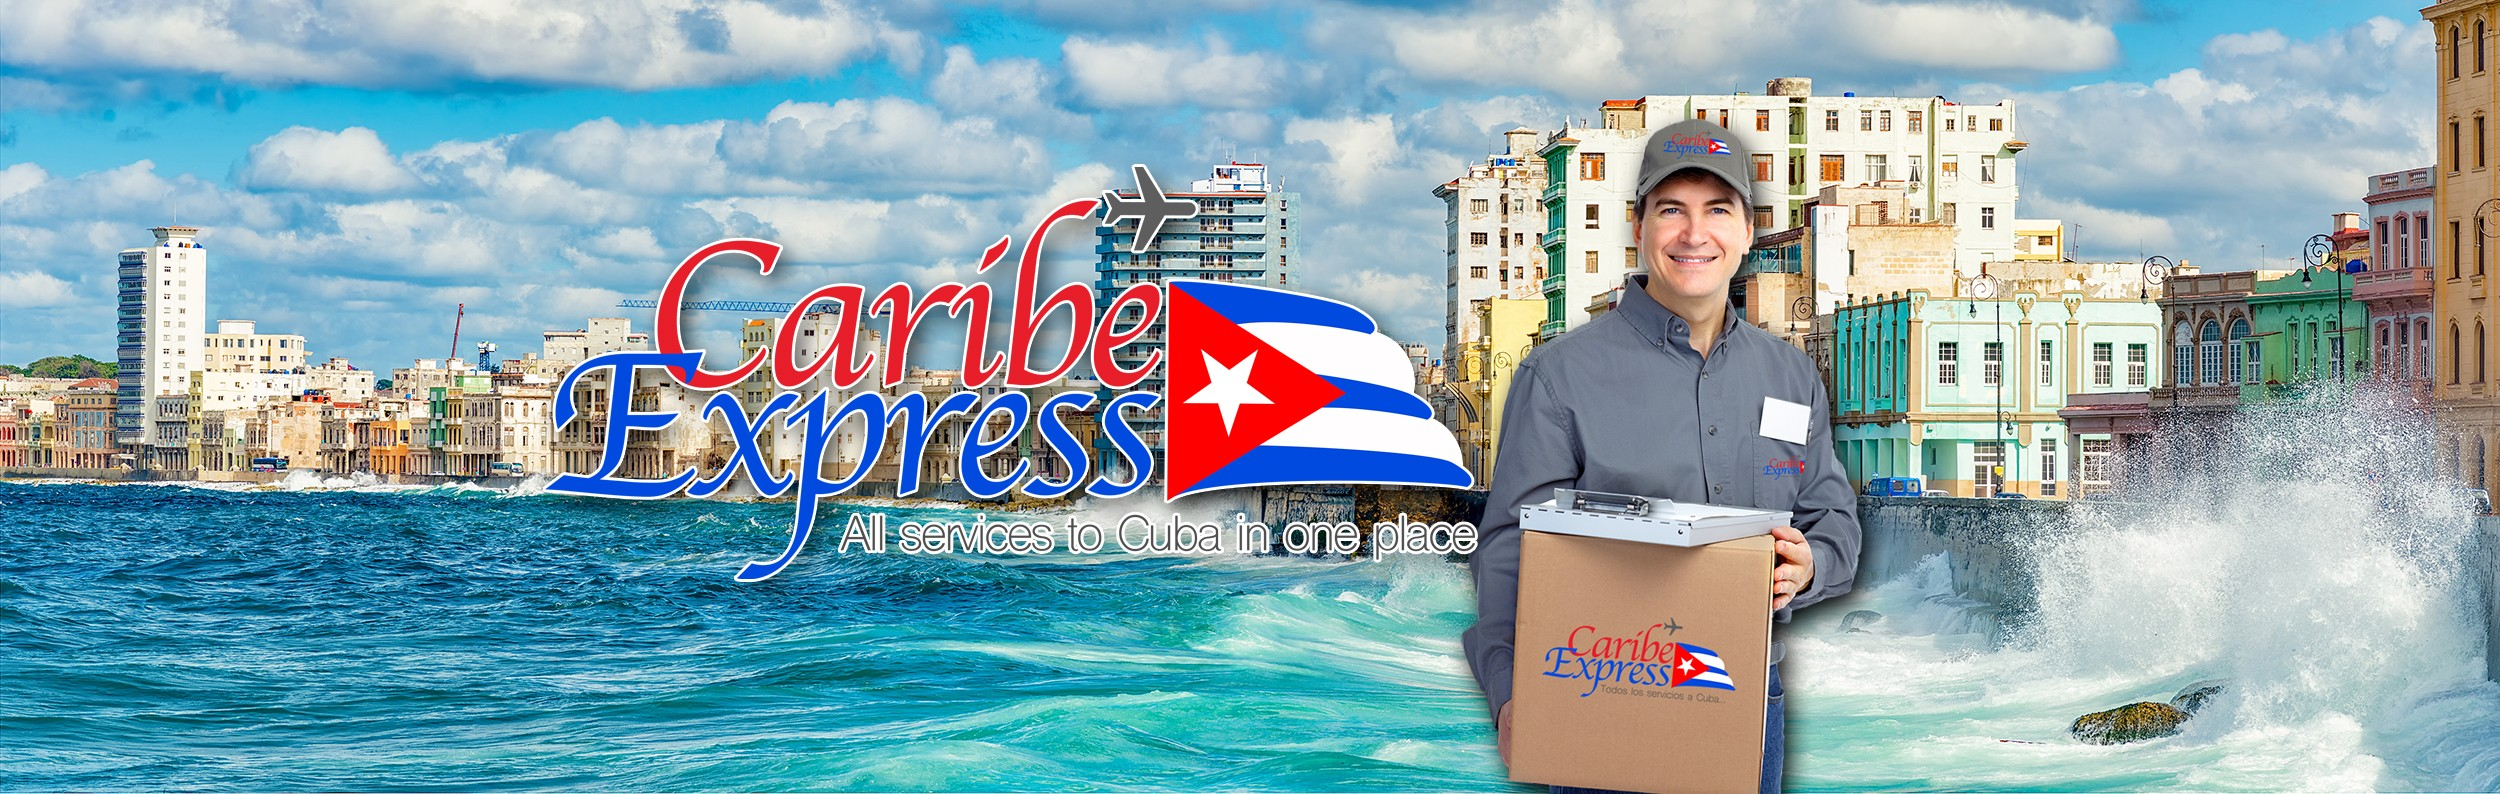 Caribe Express LLC | LinkedIn